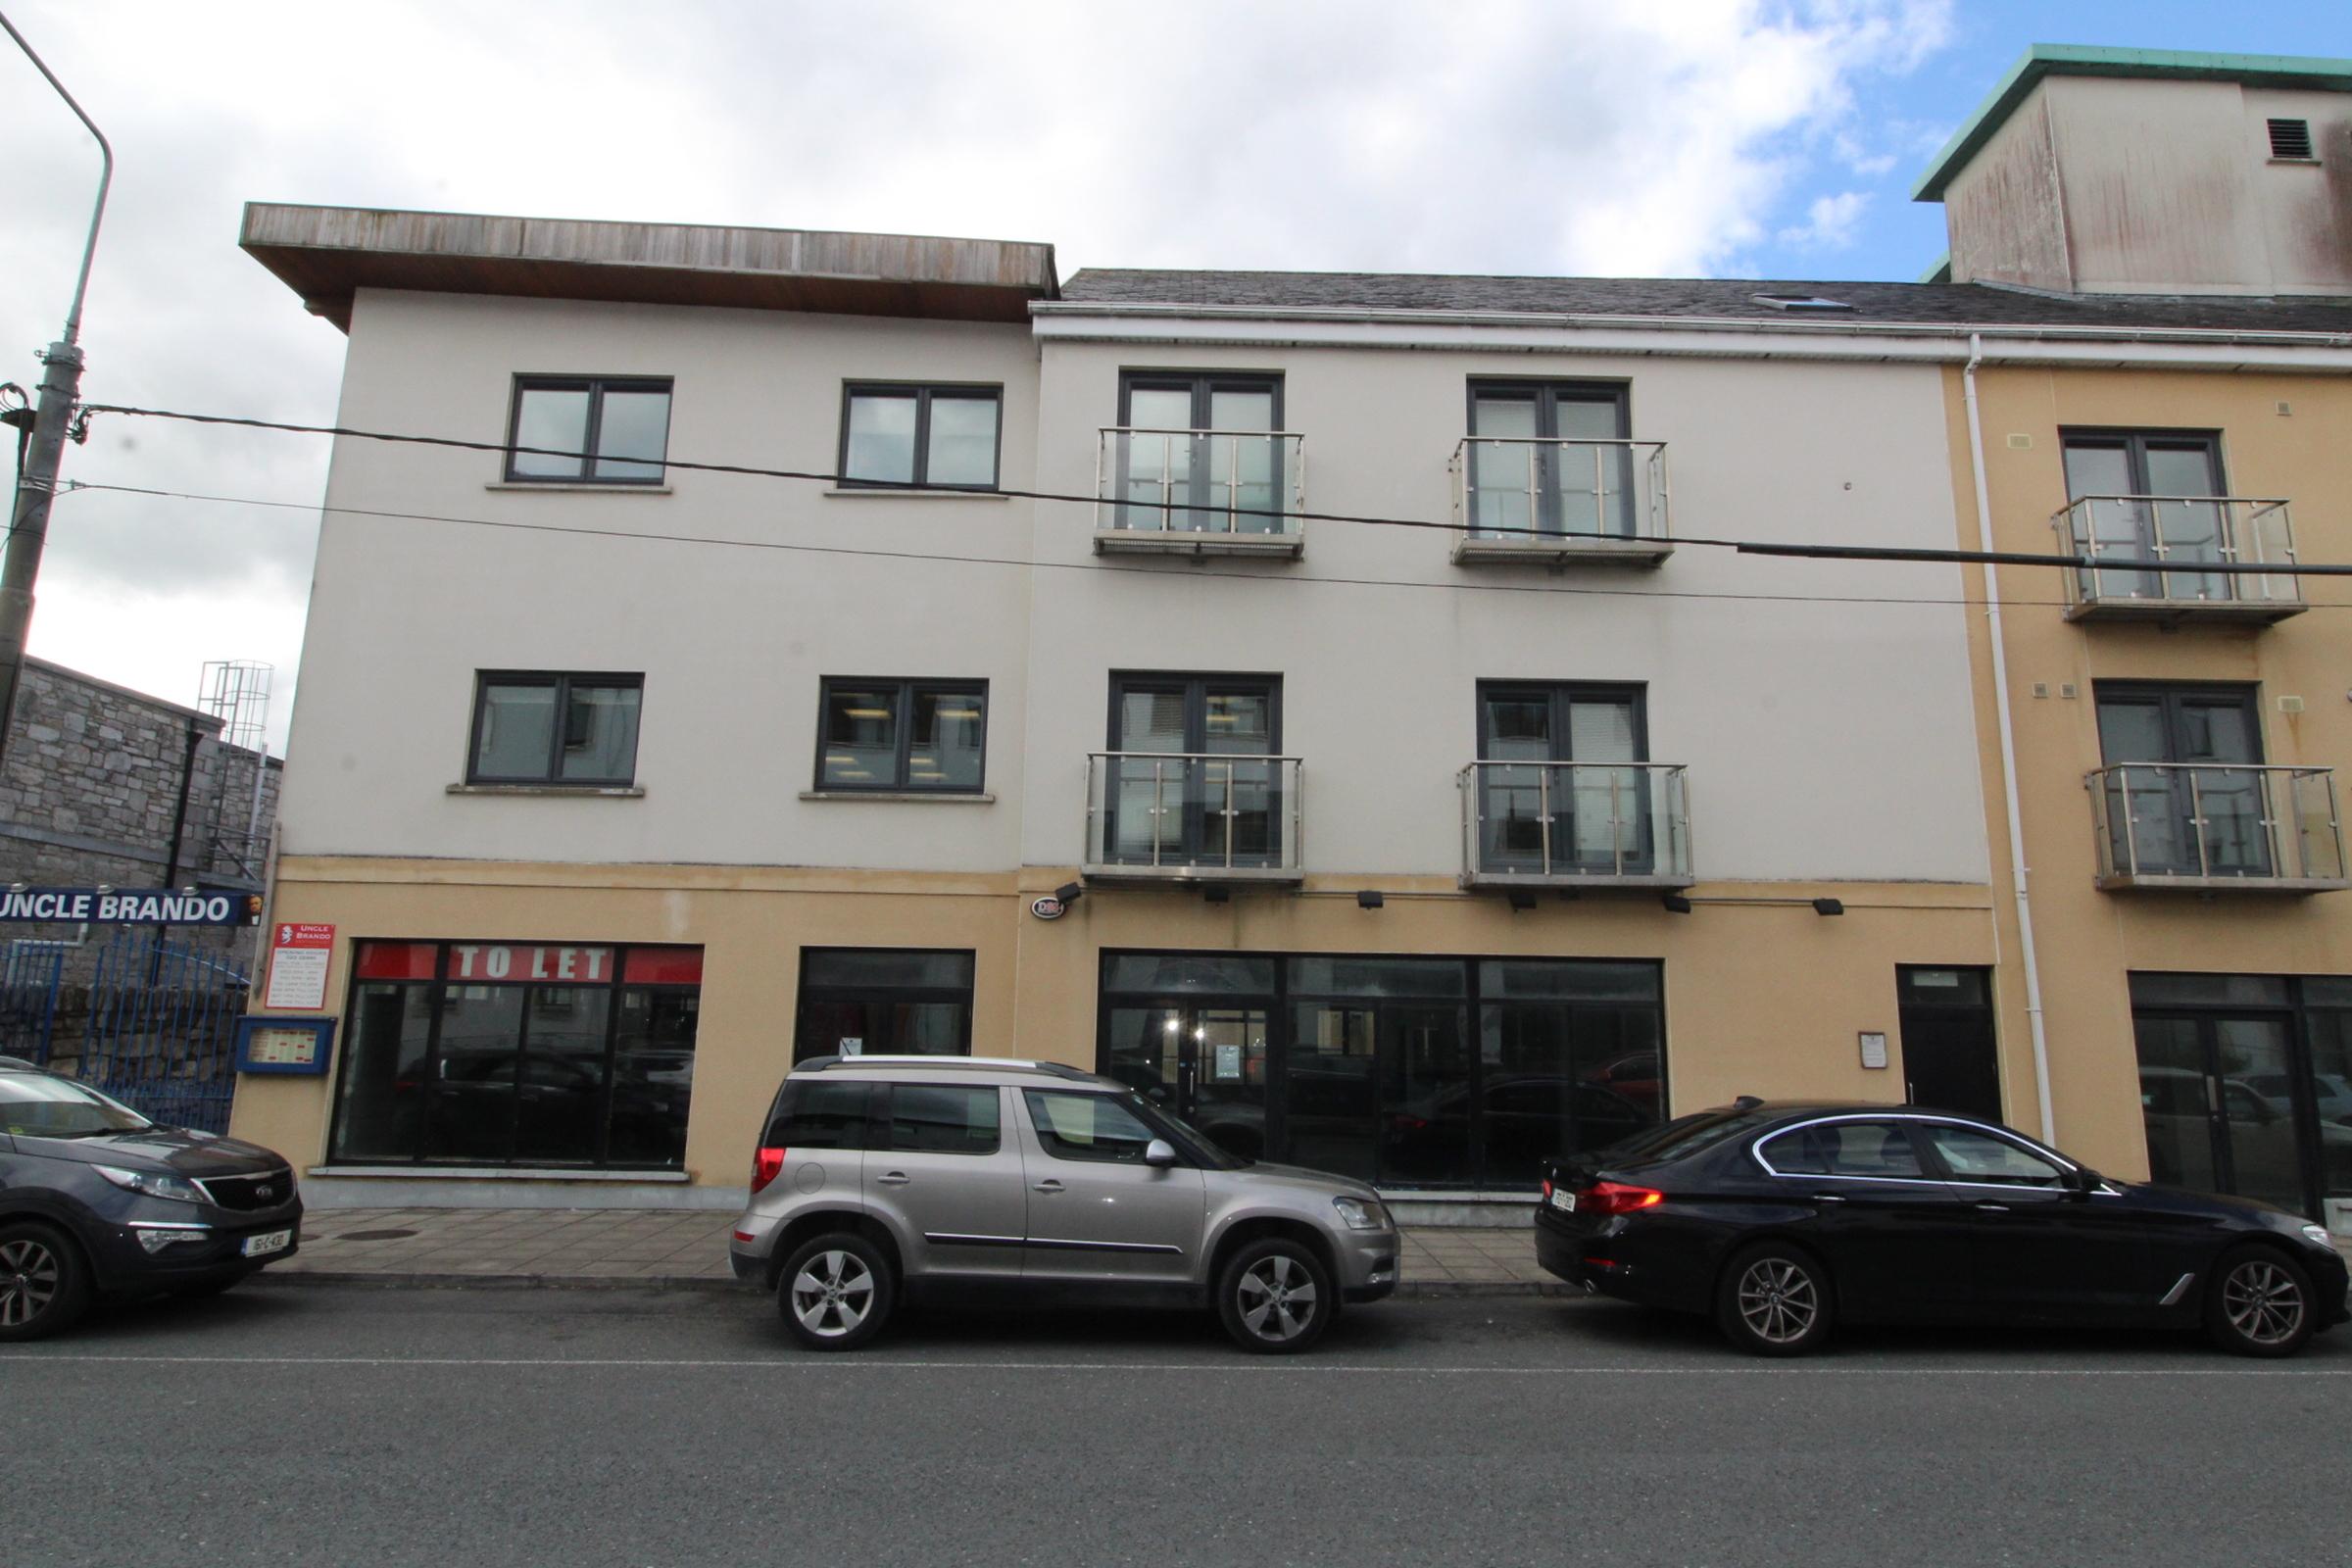 Unit 2, Fairgreen, Mallow, Co. Cork